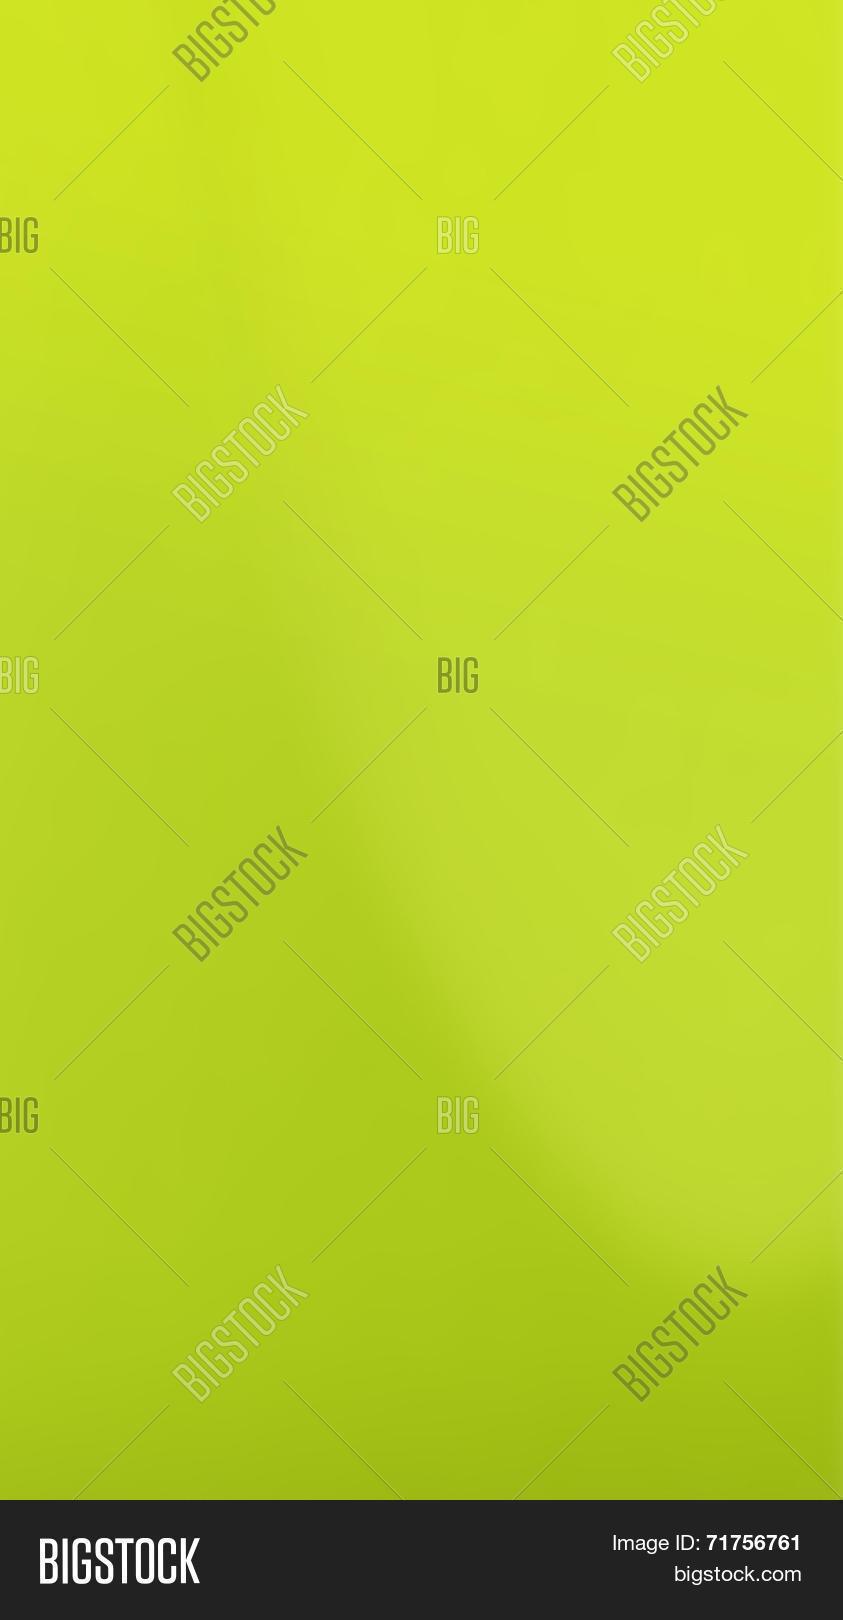 Professional Blurred Image & Photo (Free Trial) | Bigstock